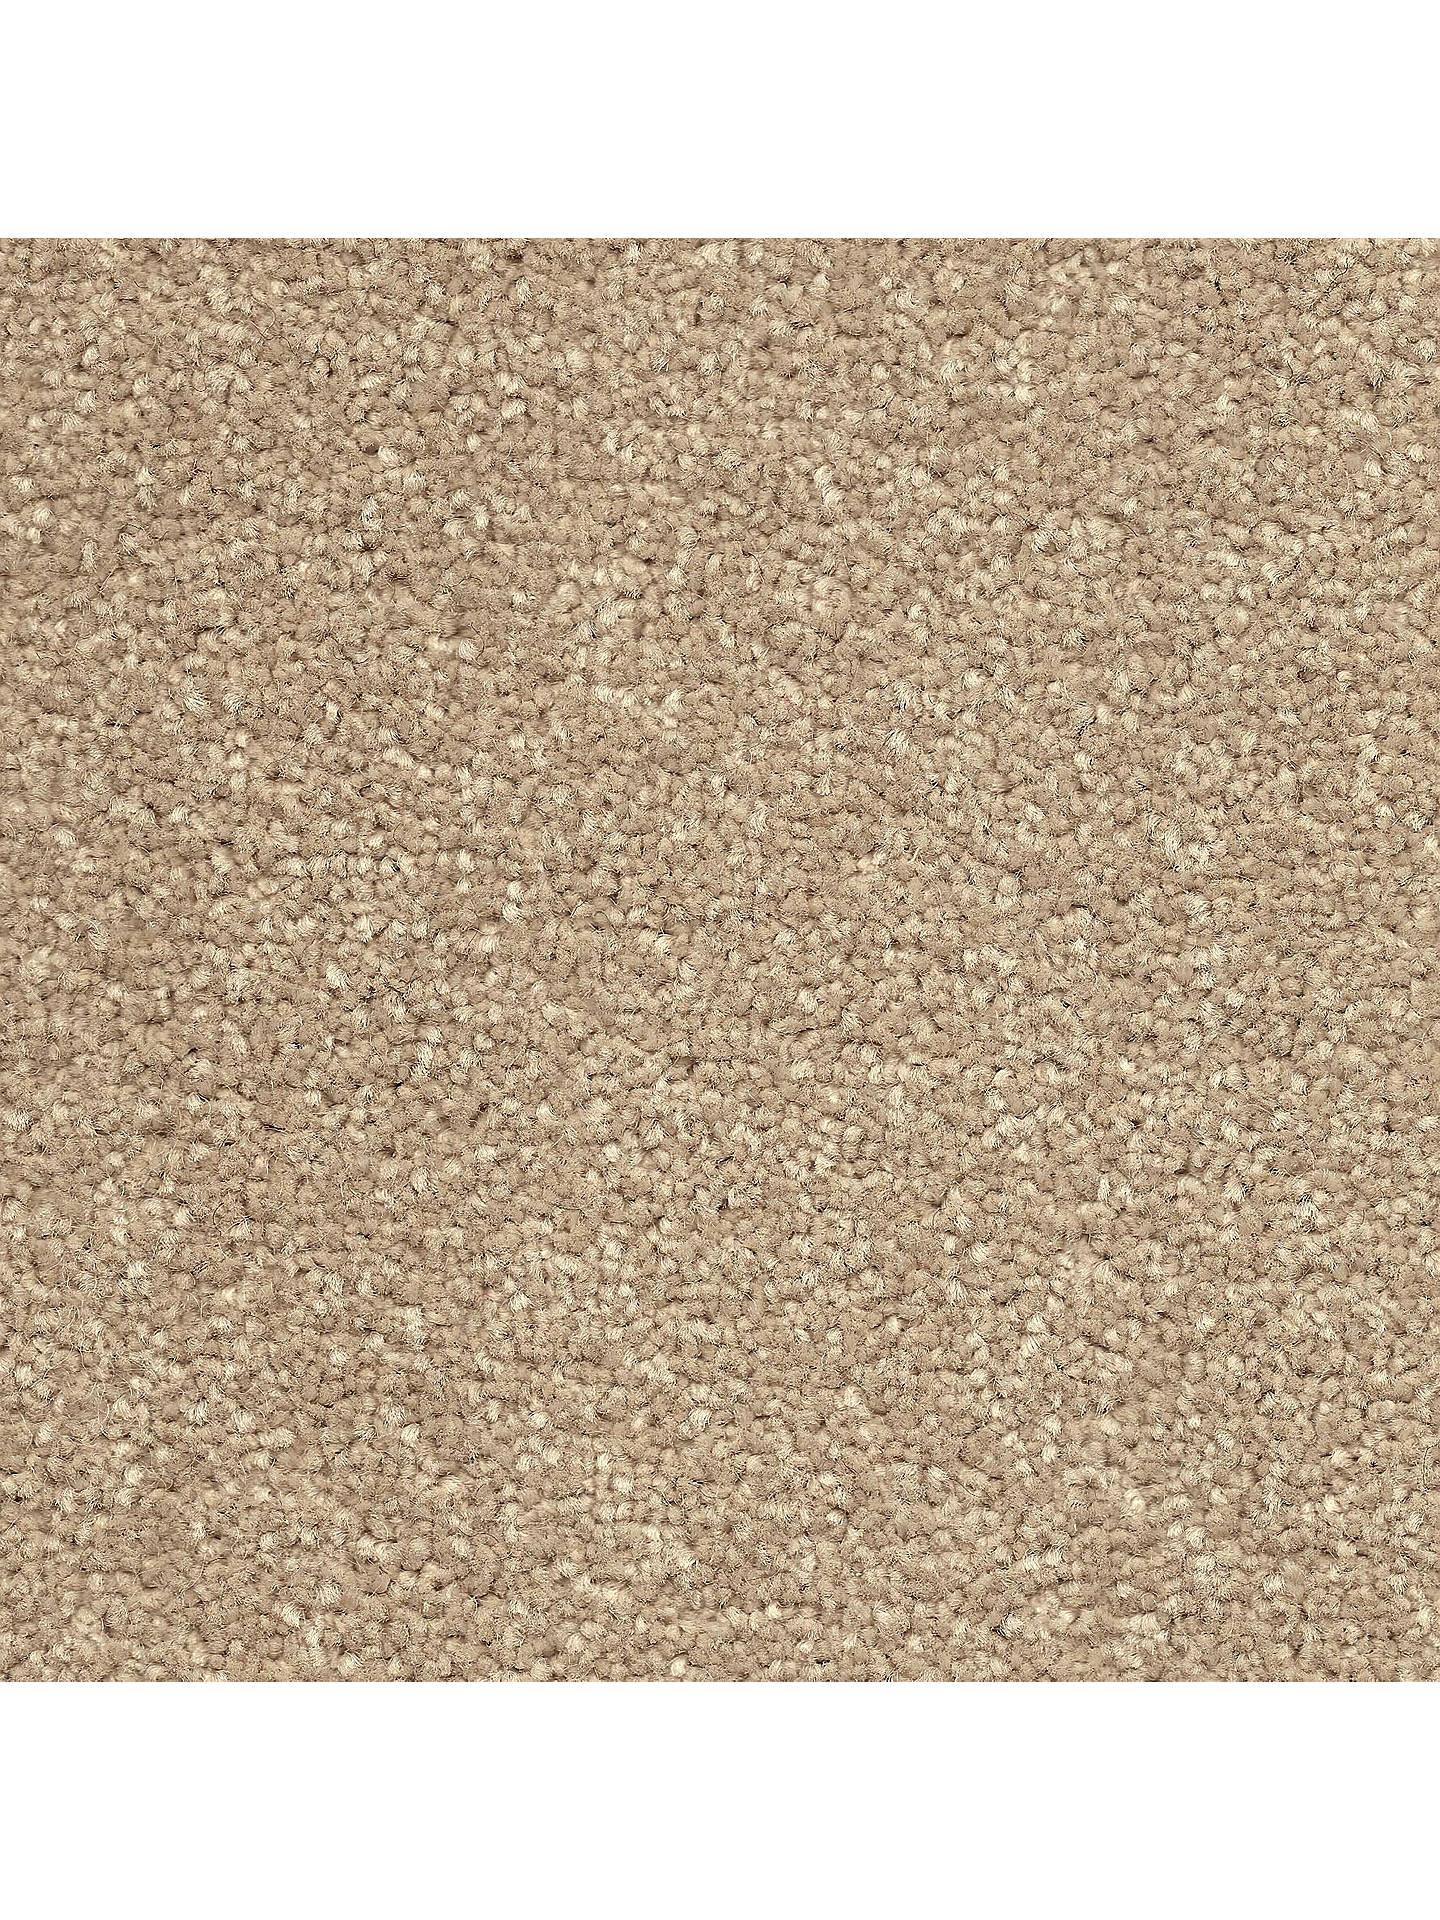 john lewis easy clean 34oz twist carpet at john lewis. Black Bedroom Furniture Sets. Home Design Ideas